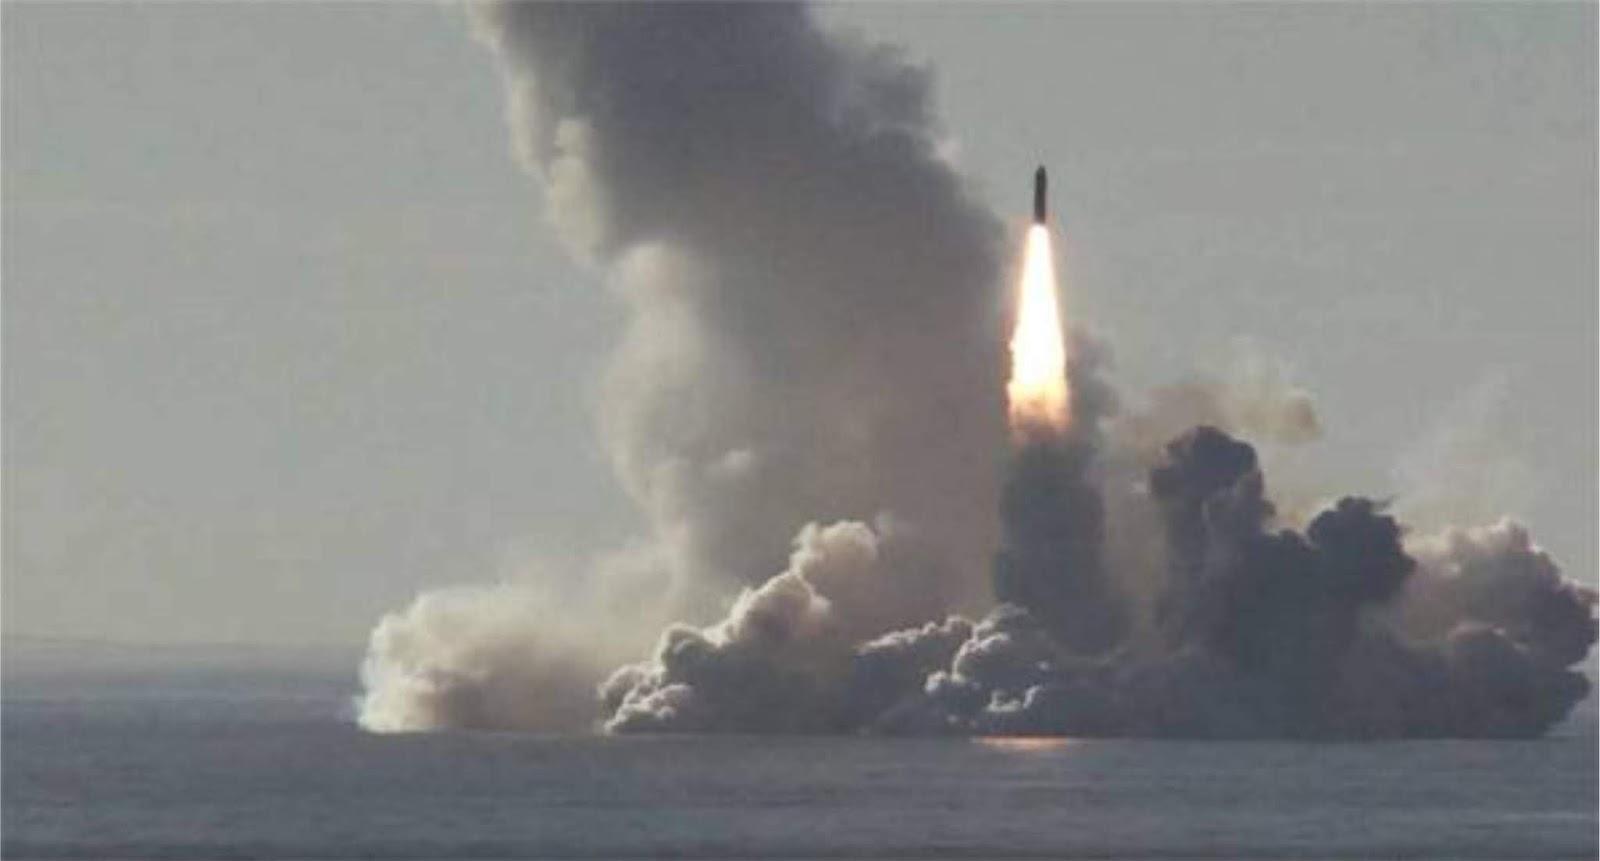 NI Rusia tidak memerlukan rudal baru untuk menghancurkan AS